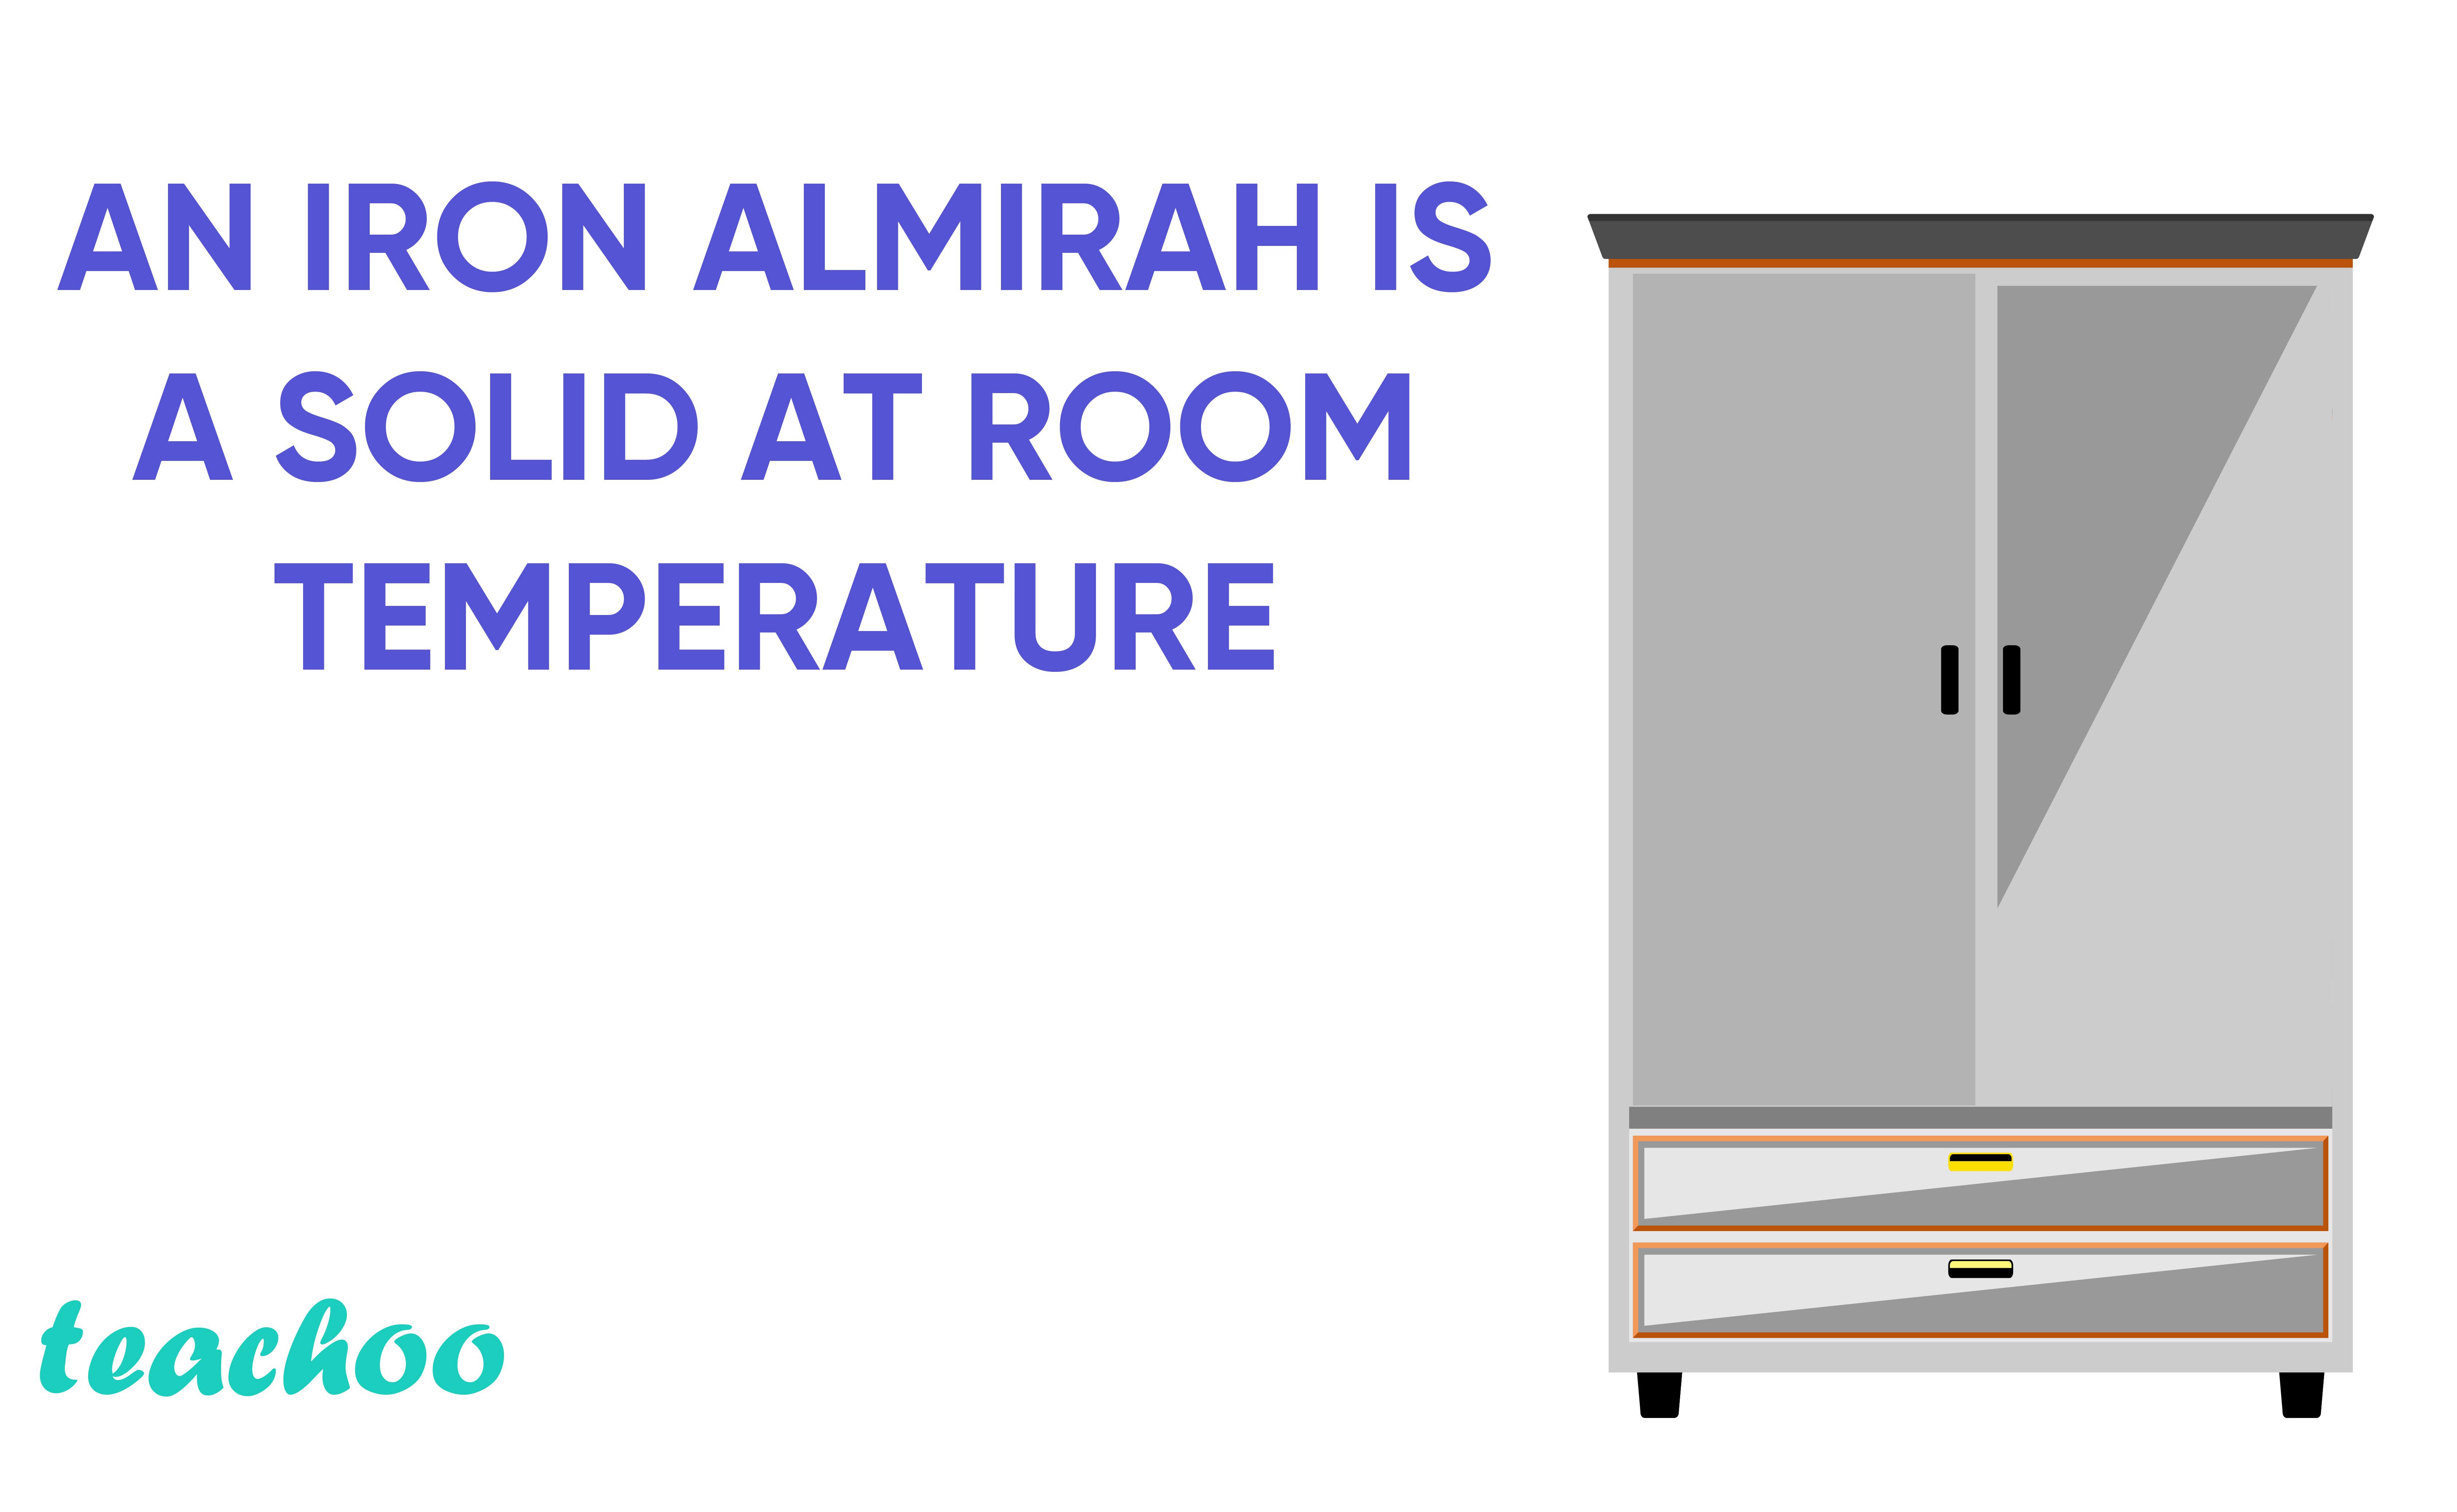 An Iron Almirah is a solid at room temperature-Teachoo.jpg